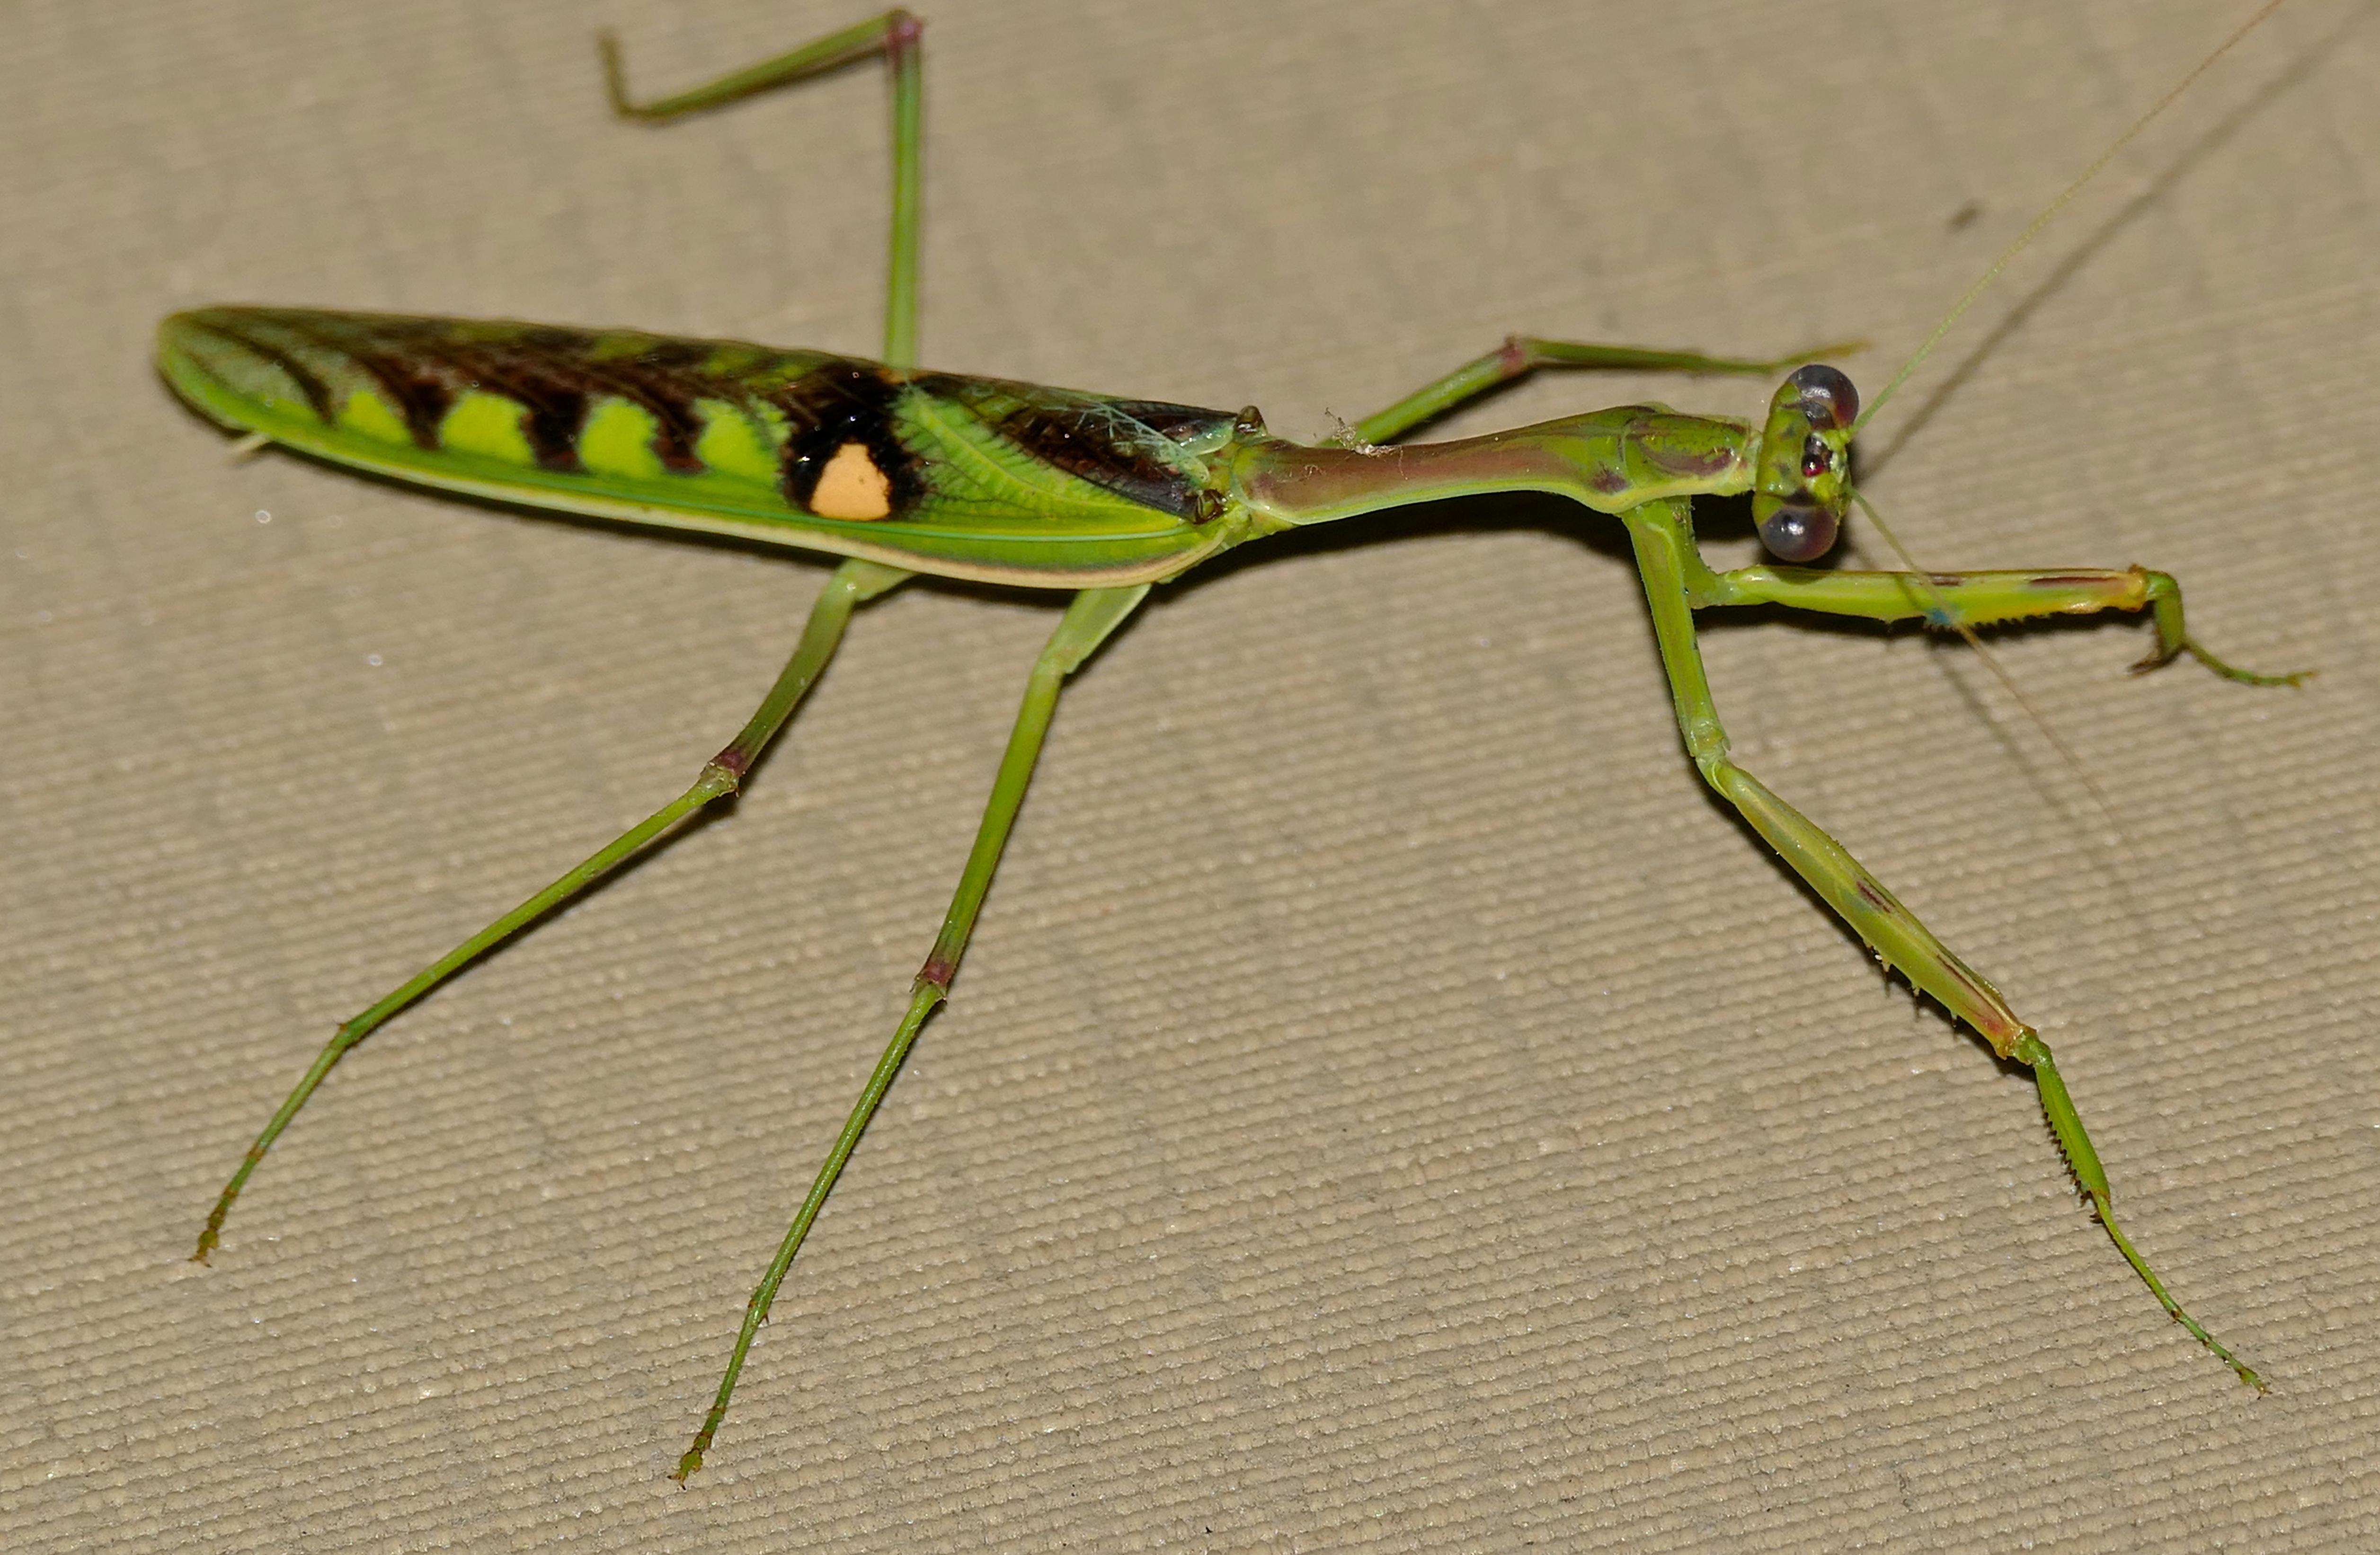 Image of zebra mantis